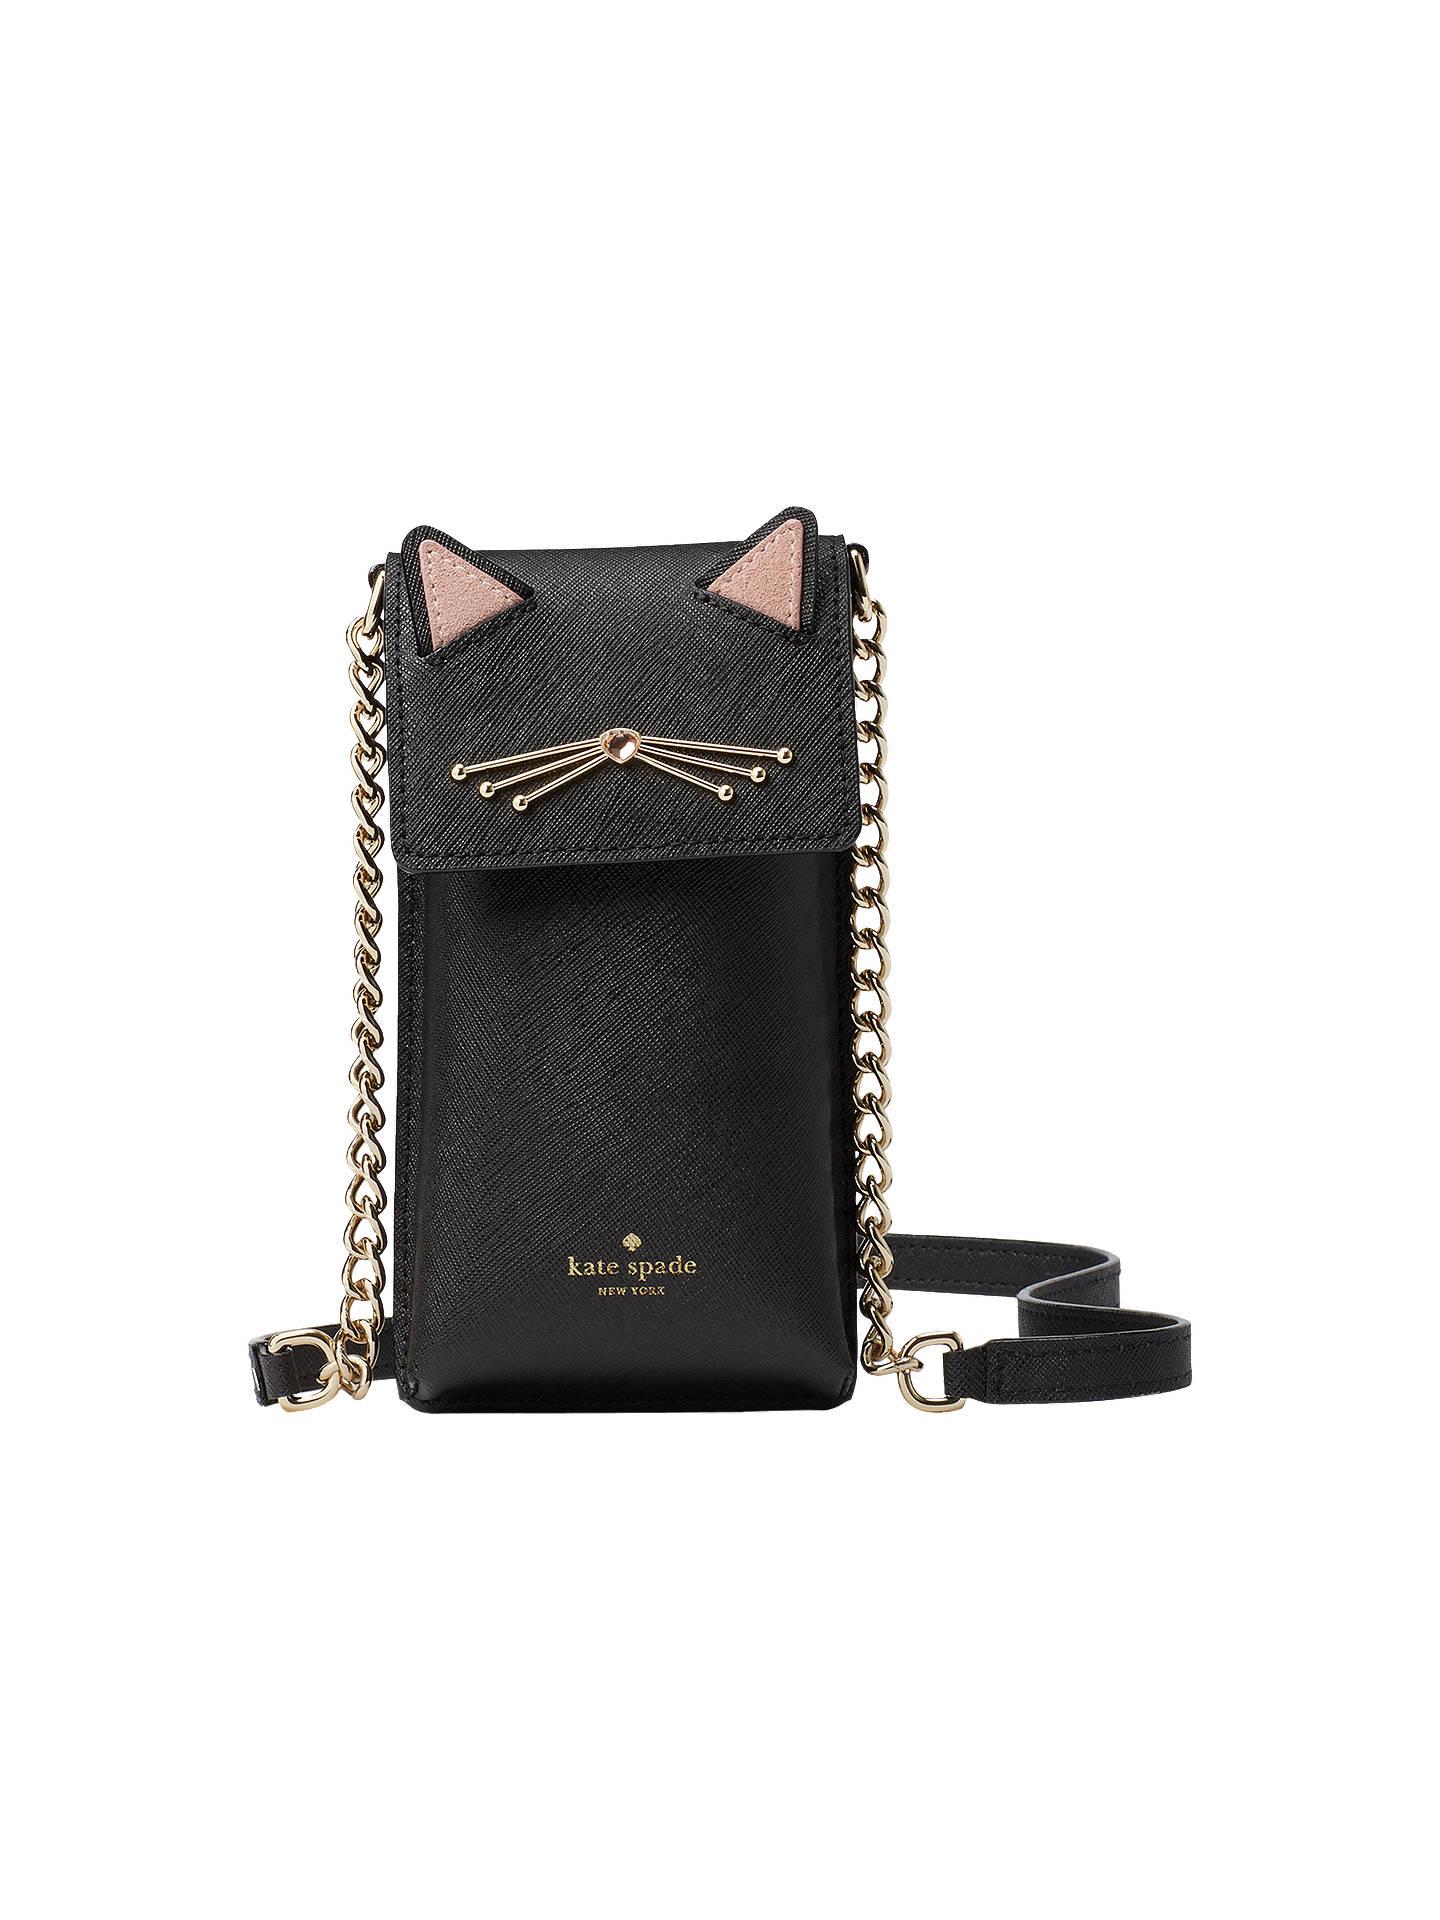 ebf19ab35cec Buy kate spade new york Cat's Meow North South Cross Body Smart Phone Case,  Black ...